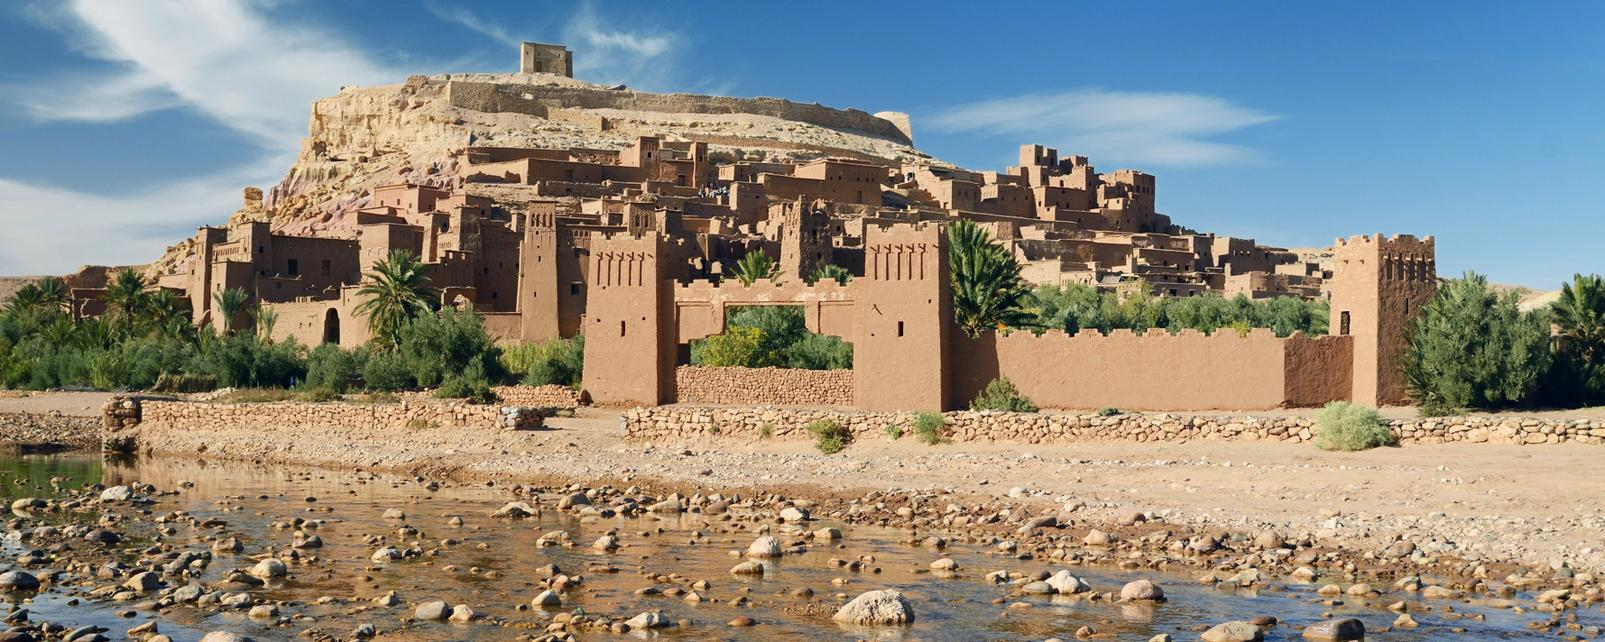 Afrique; Maroc; Ouarzazate;